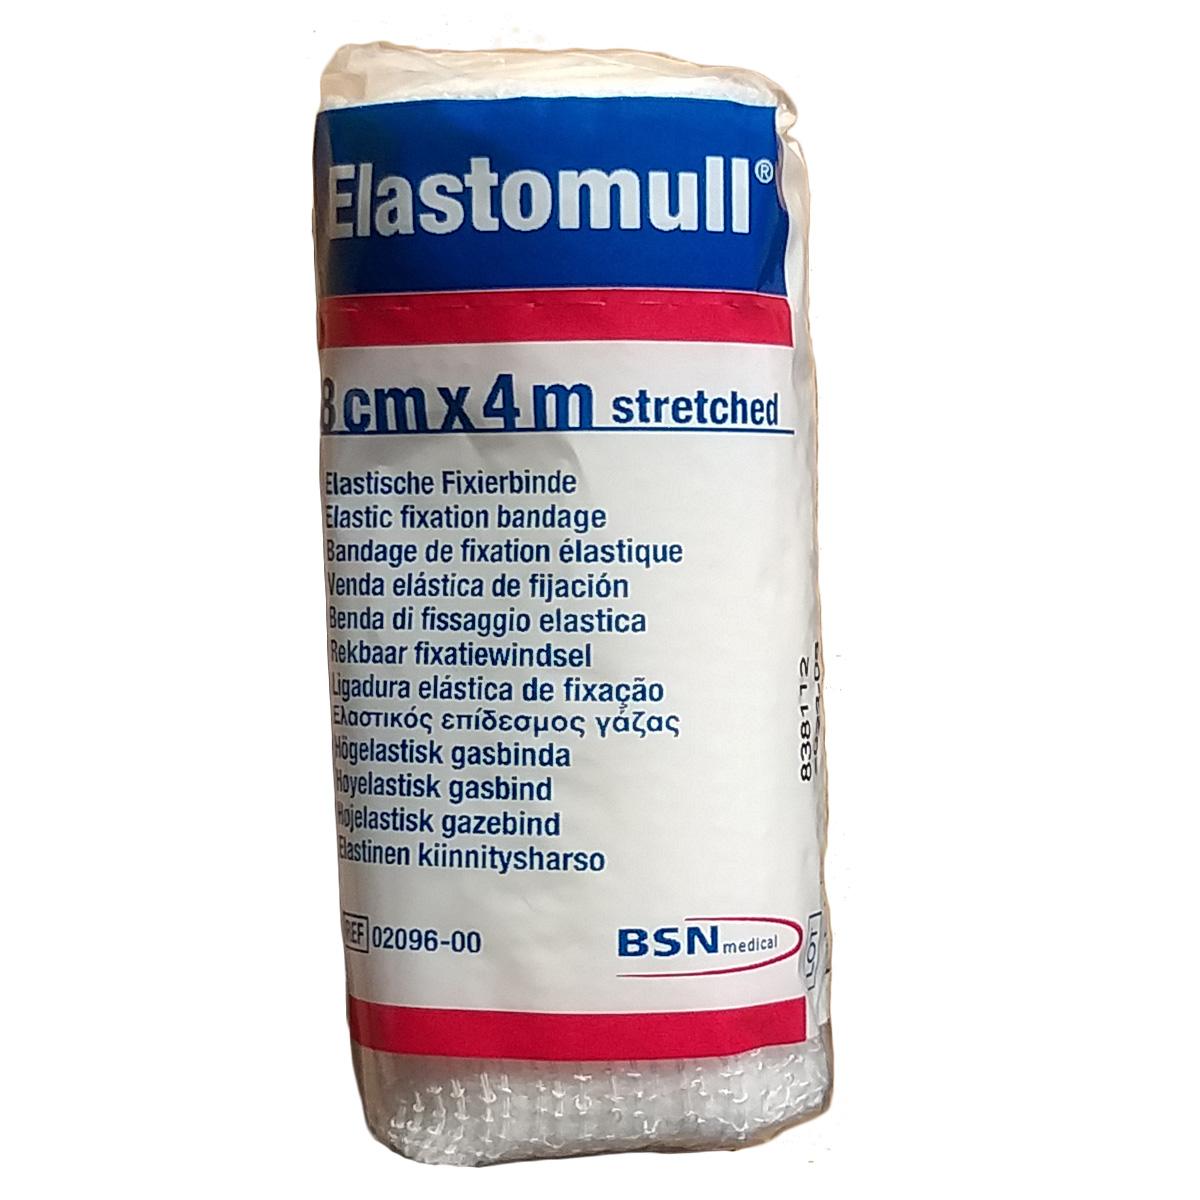 Elastomull 8 cms x 4 mts